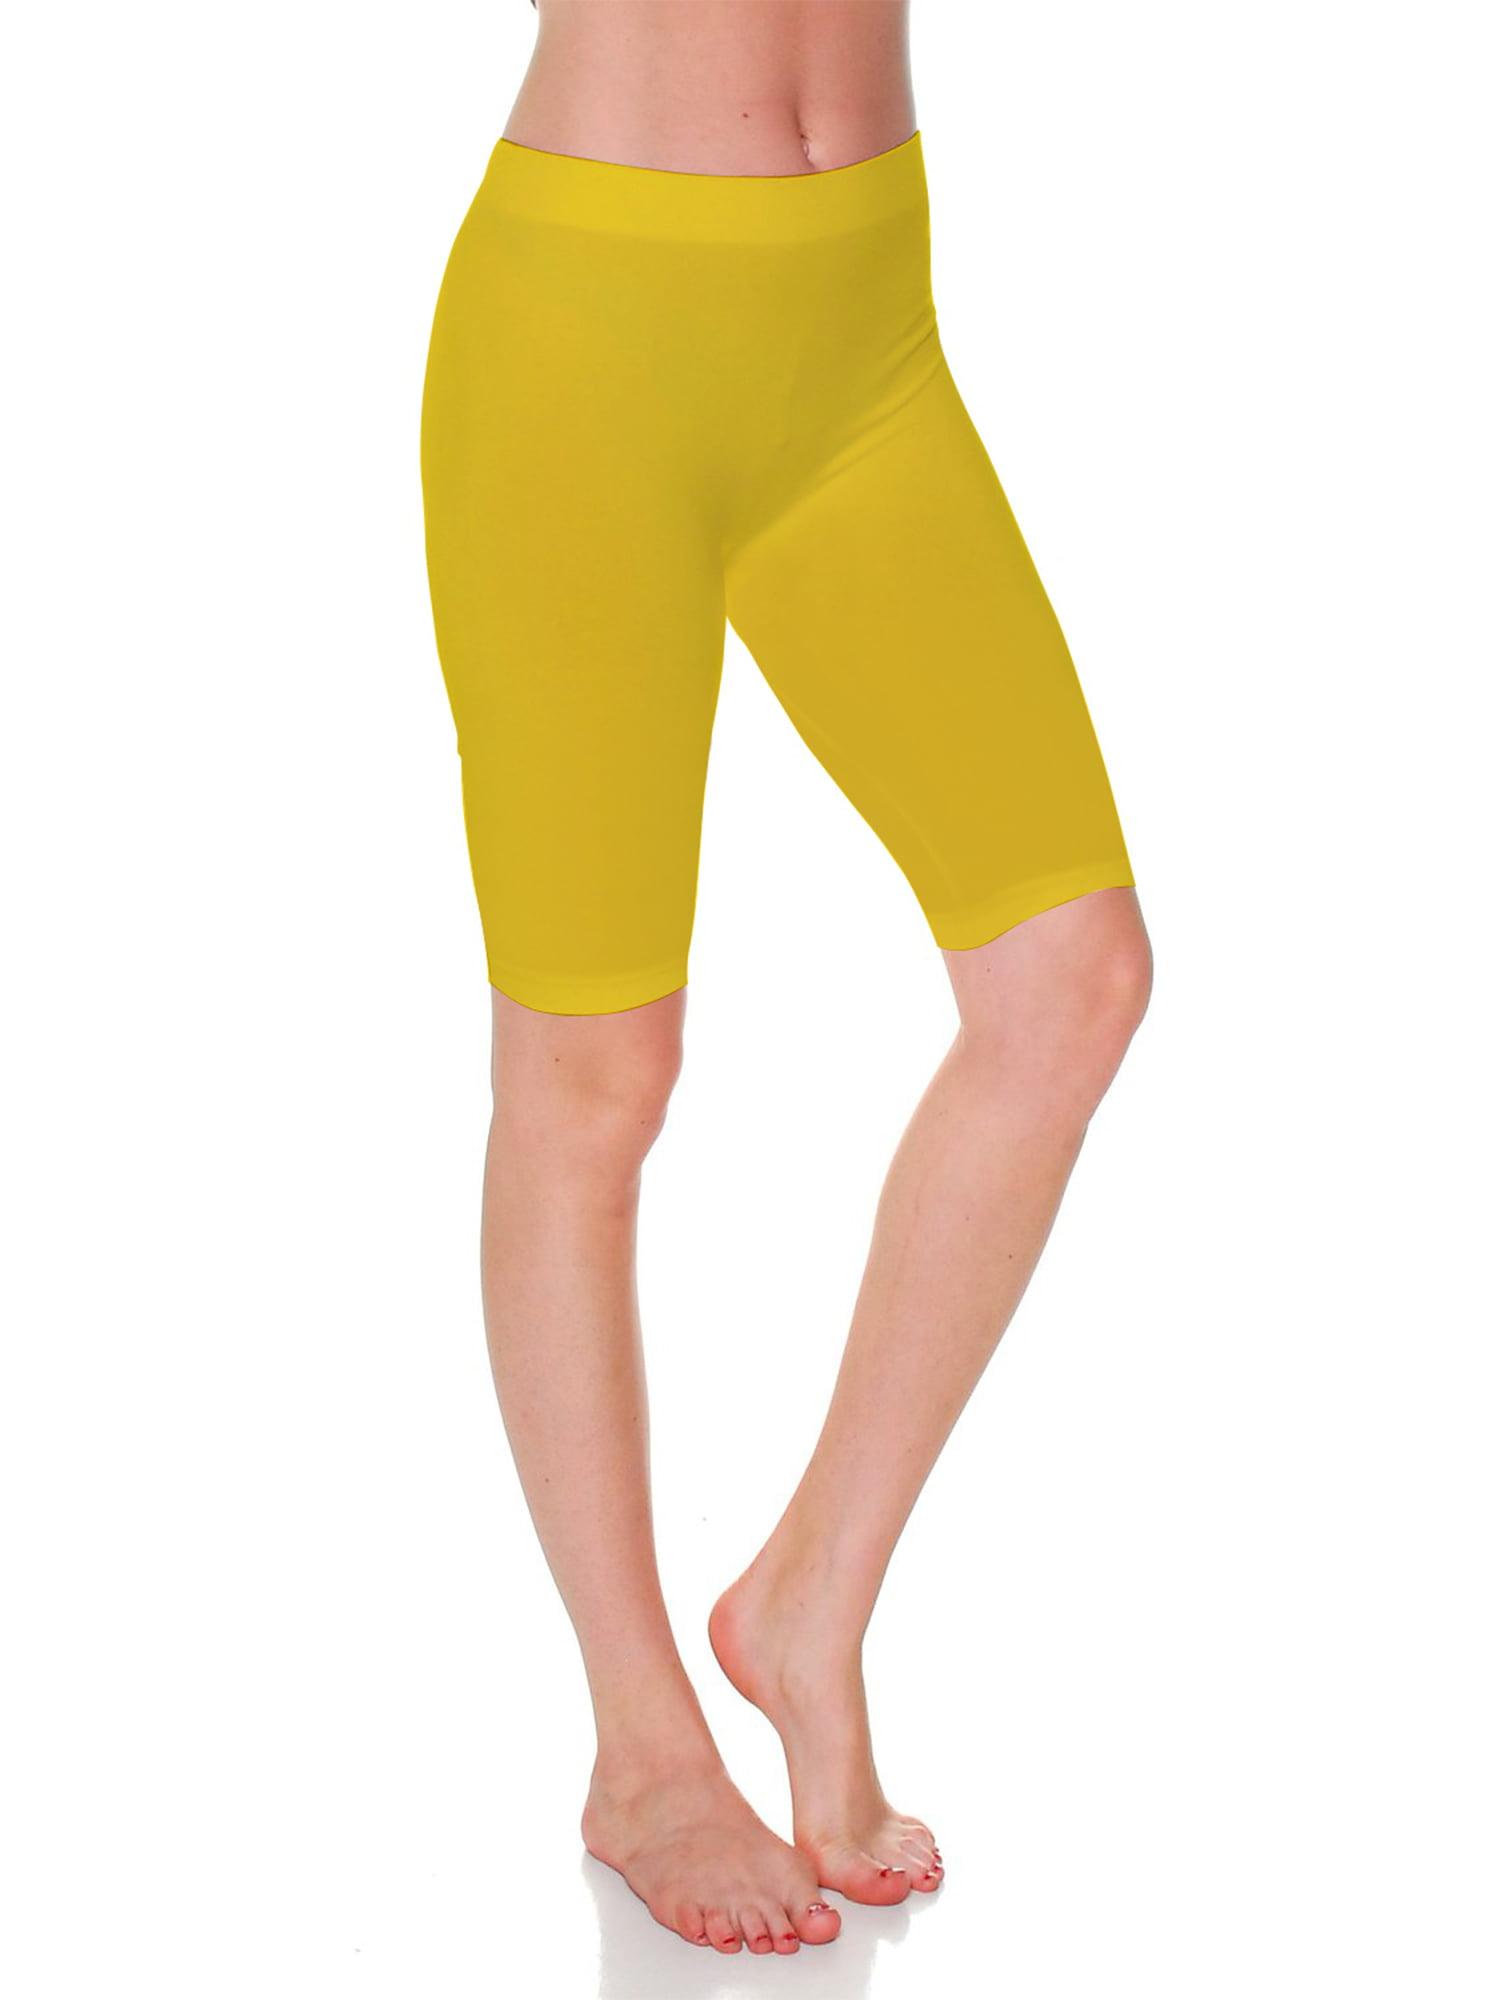 Essential Basic Women Capri 17 IN Knee Length Bermuda Seamless Legging - Jr to Plus